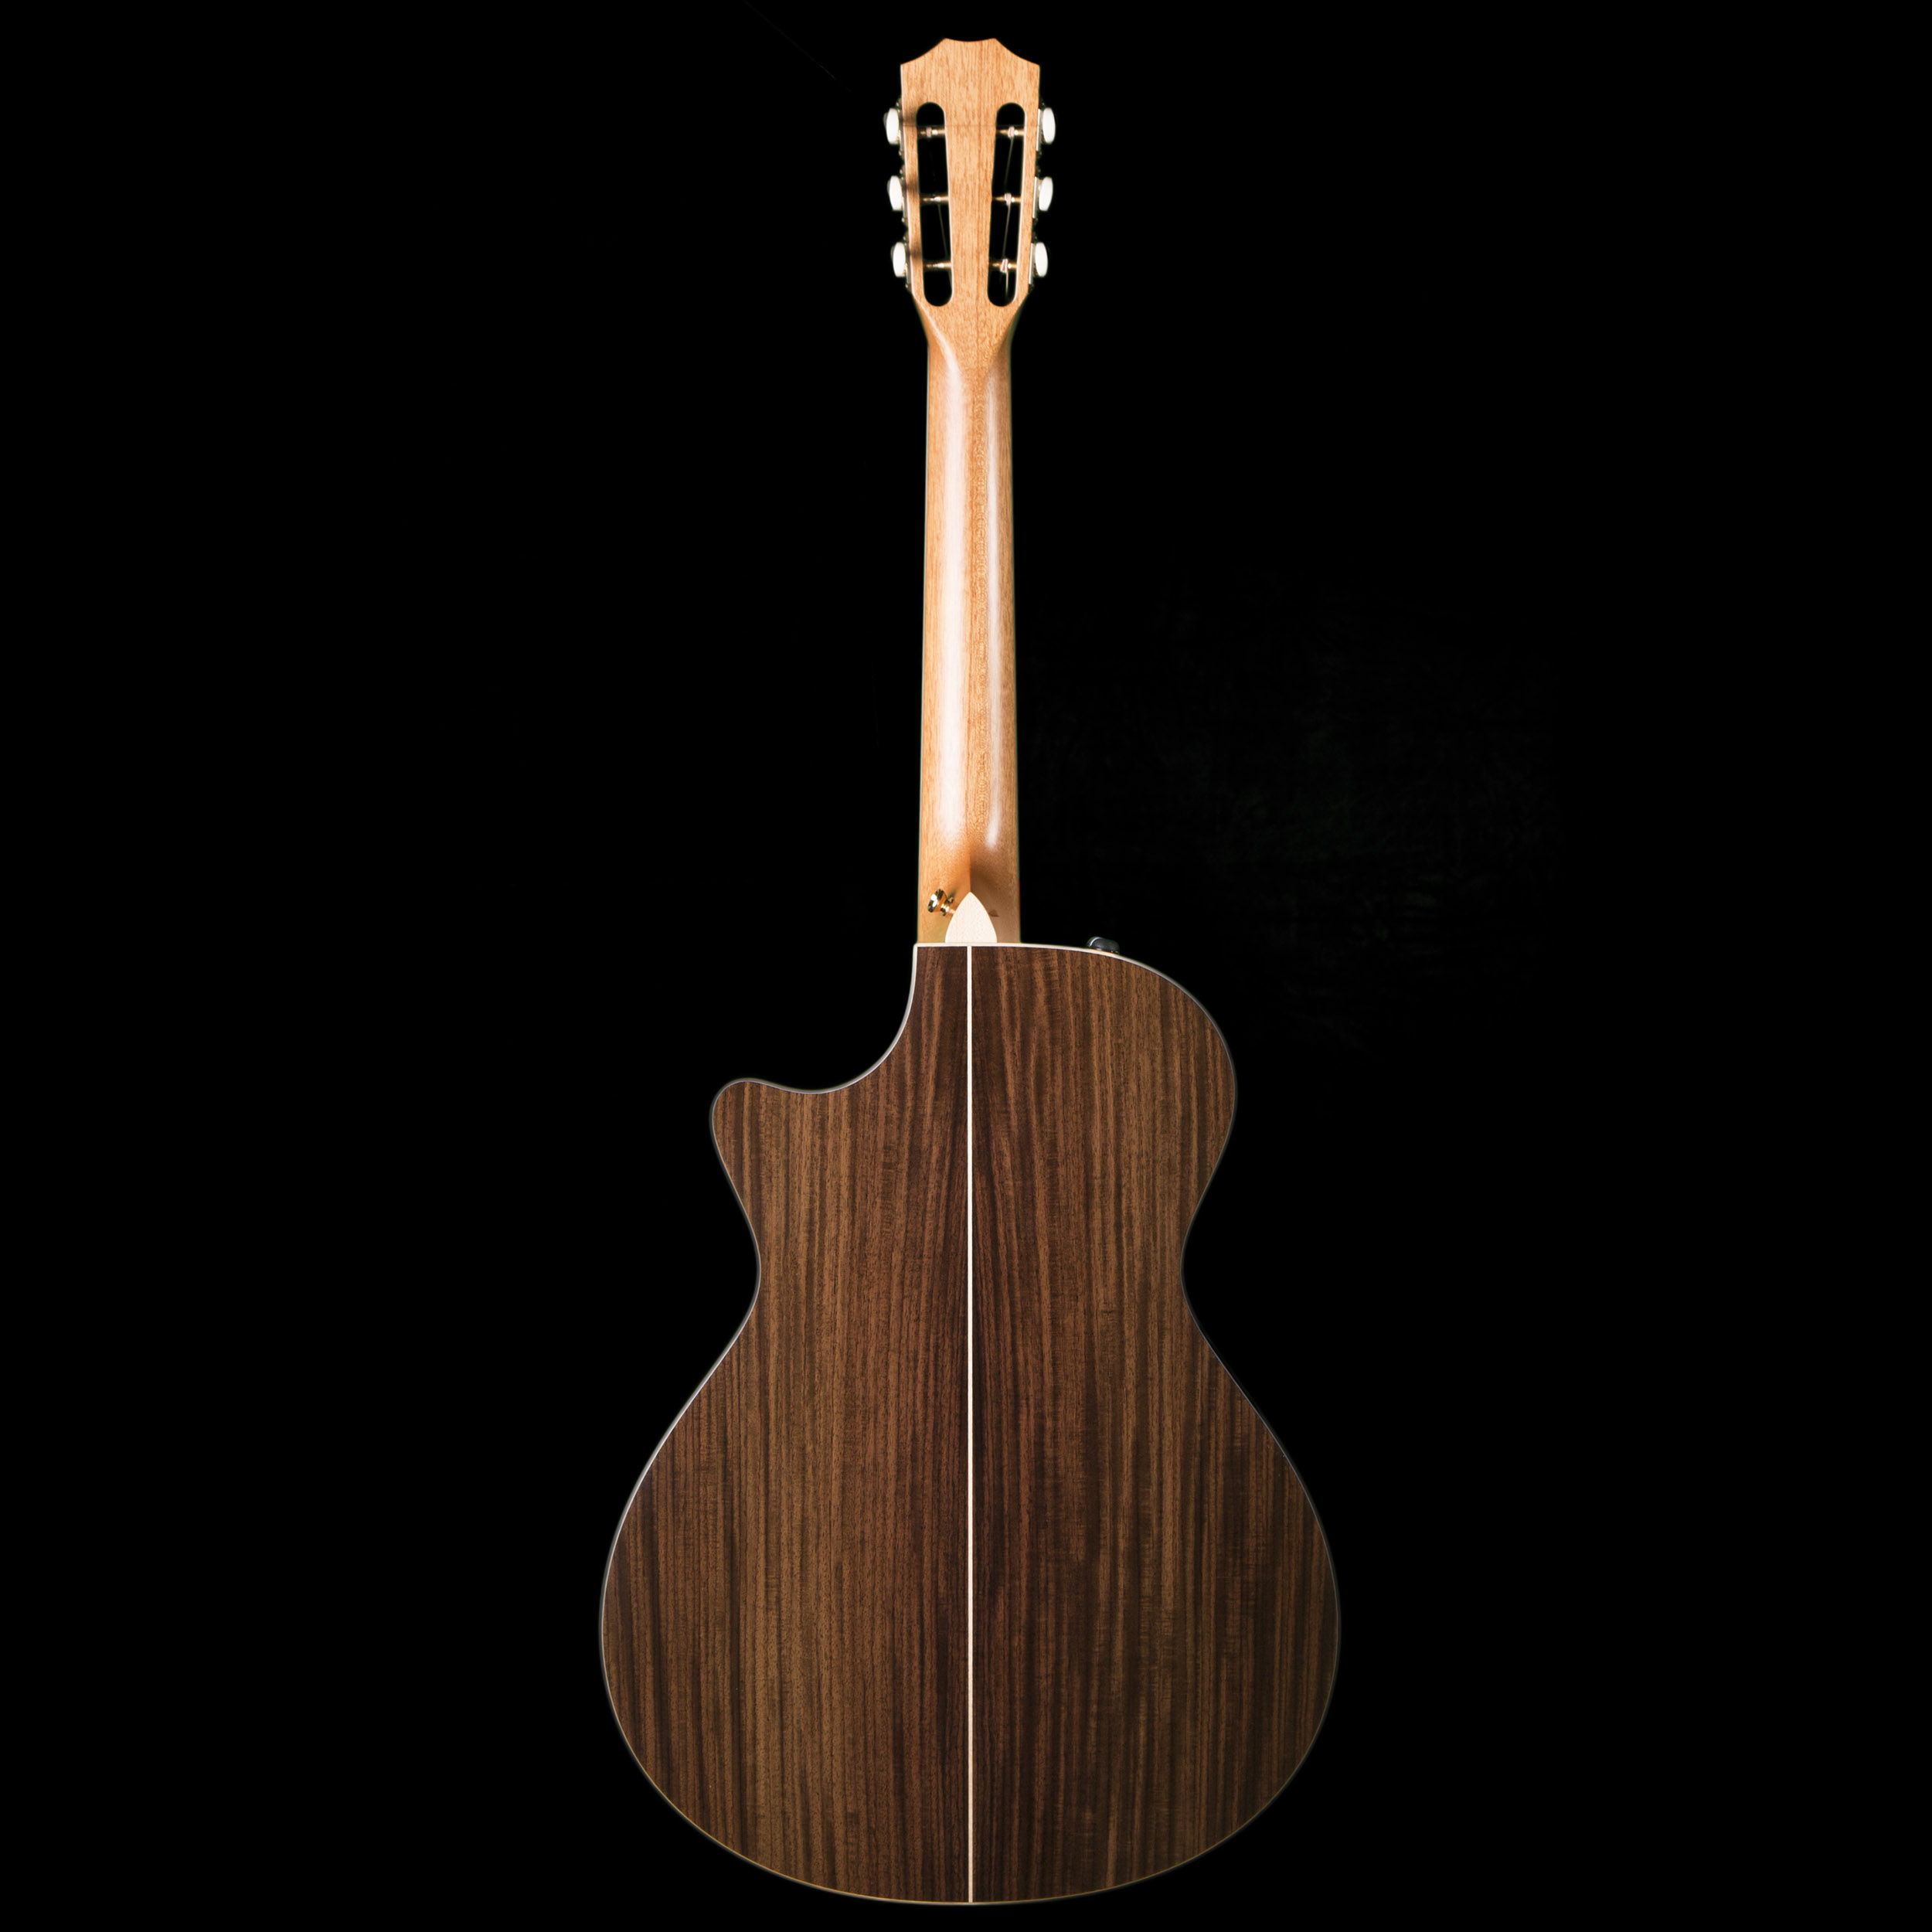 taylor 812ce deluxe 12 fret grand concert acoustic electric guitar ebay. Black Bedroom Furniture Sets. Home Design Ideas